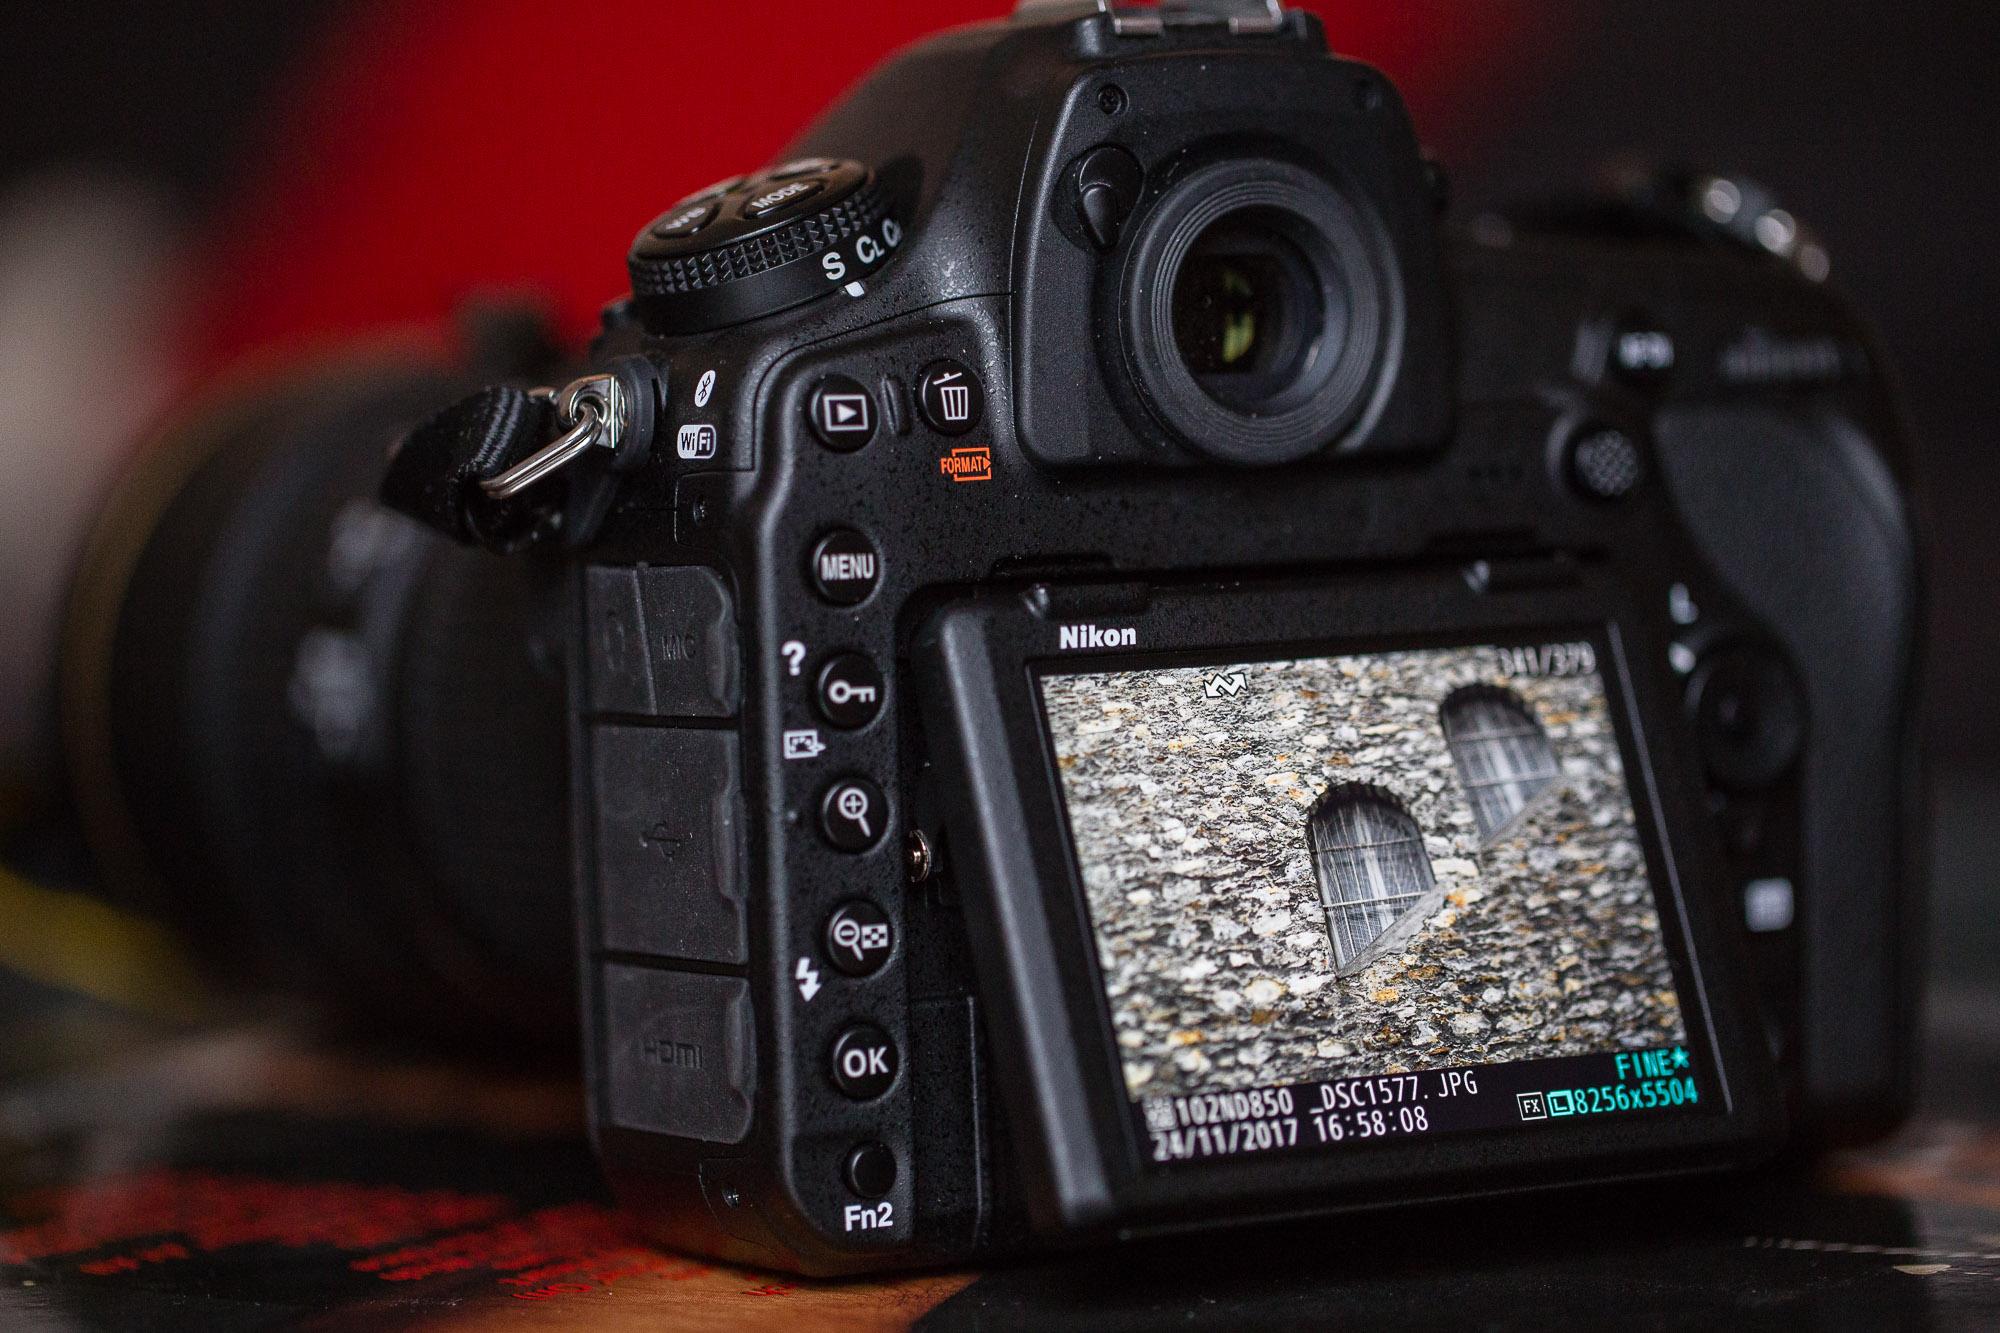 Appareille photo numerique canon Sigma 70-300mm f/ DG Macro Monture Nikon